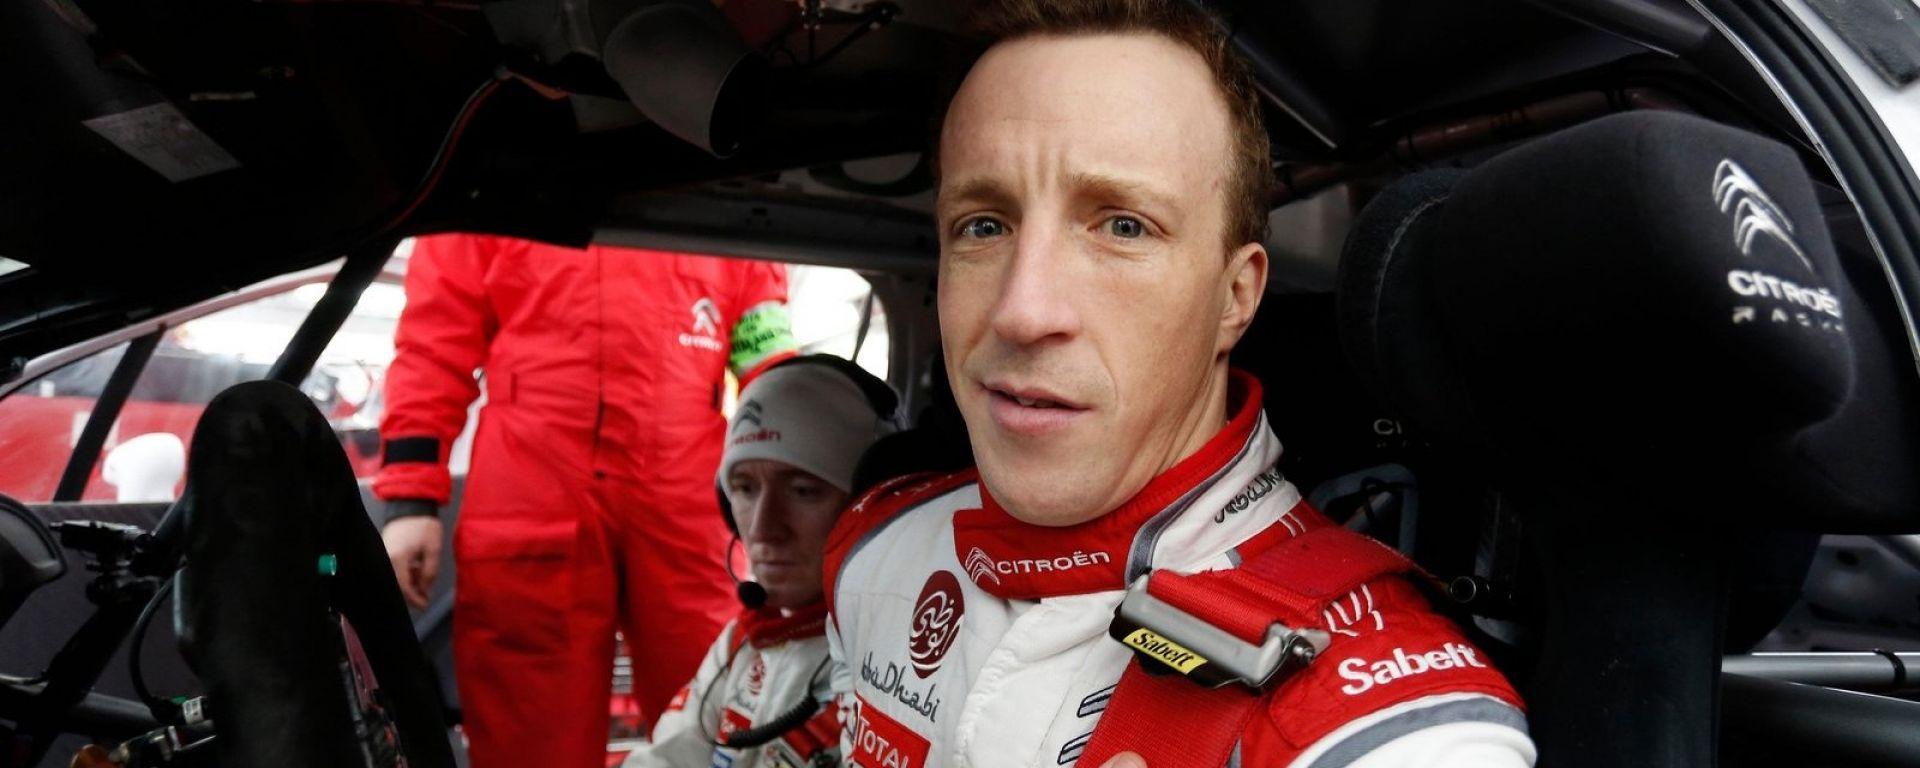 Kris Meeke - il pilota ufficiale e punta di diamante del team Citroen Racing